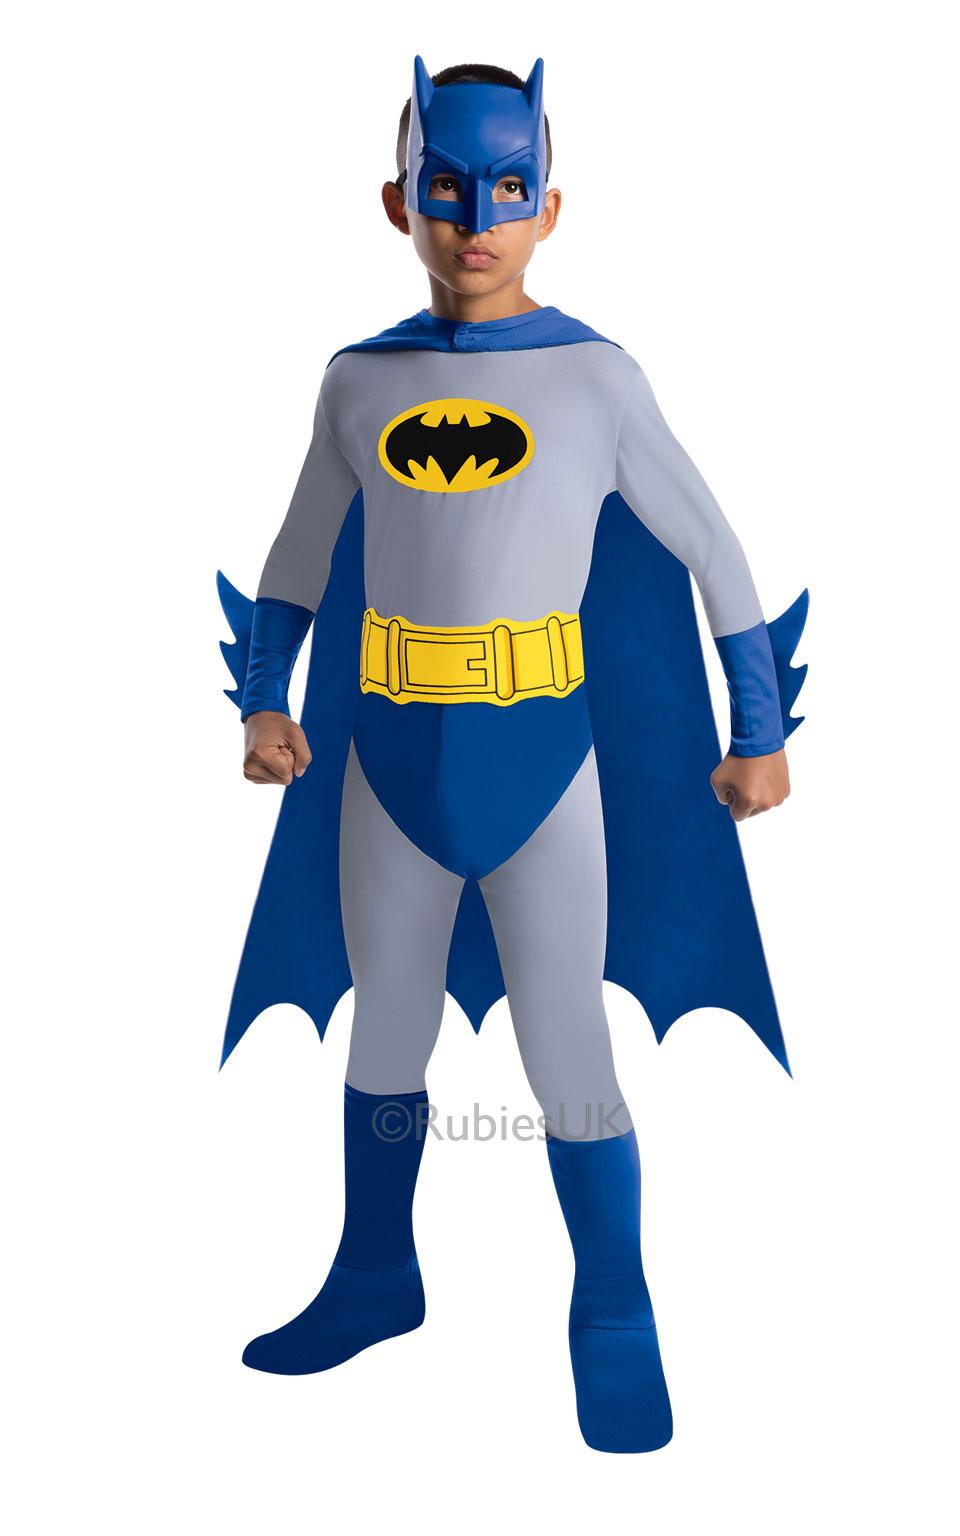 Licensed Batman Costume Childrens Metallic Batman Superhero Fancy Dress Outfit